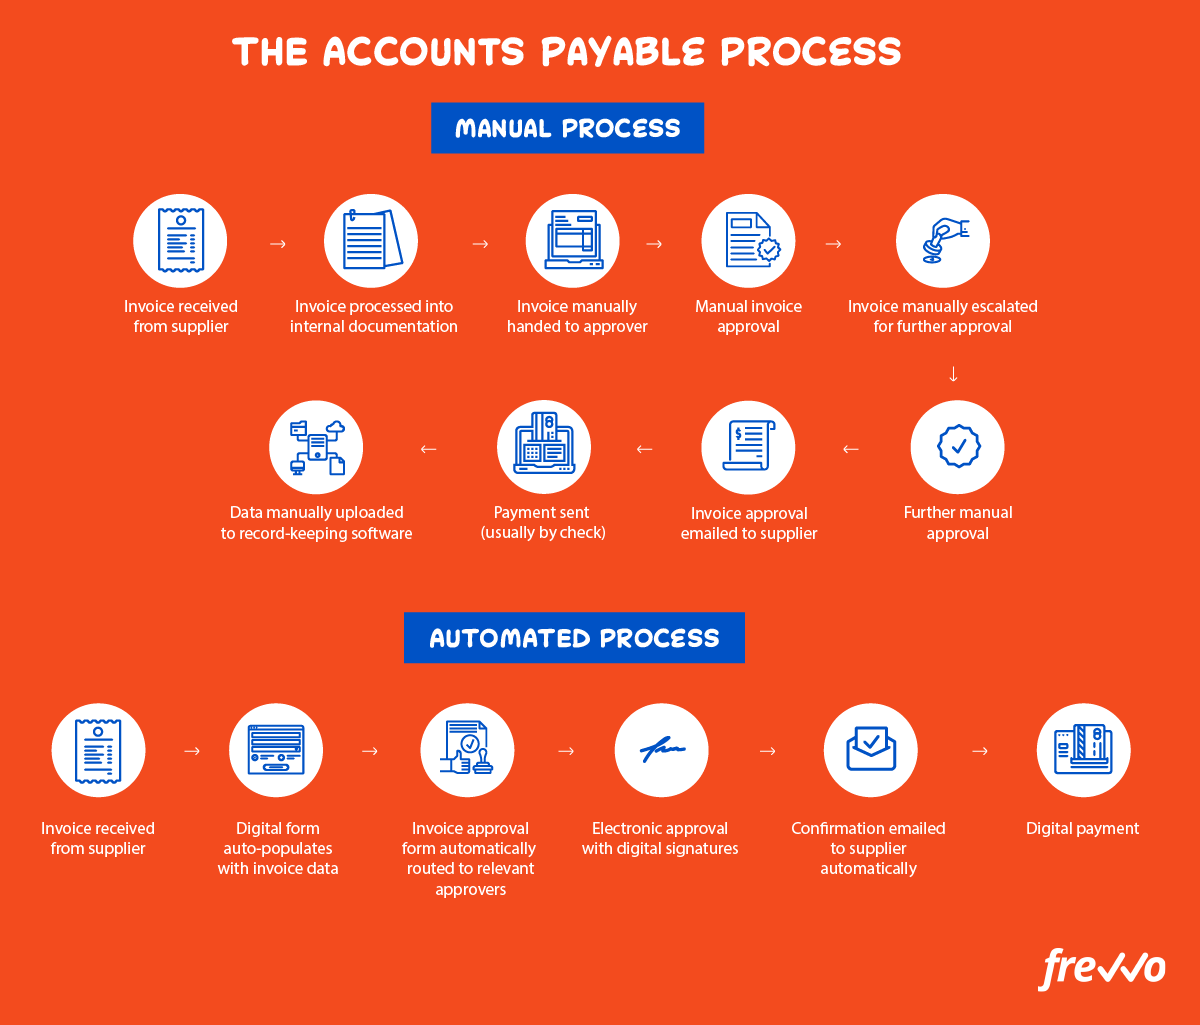 manual accounts payable process vs automated invoice process